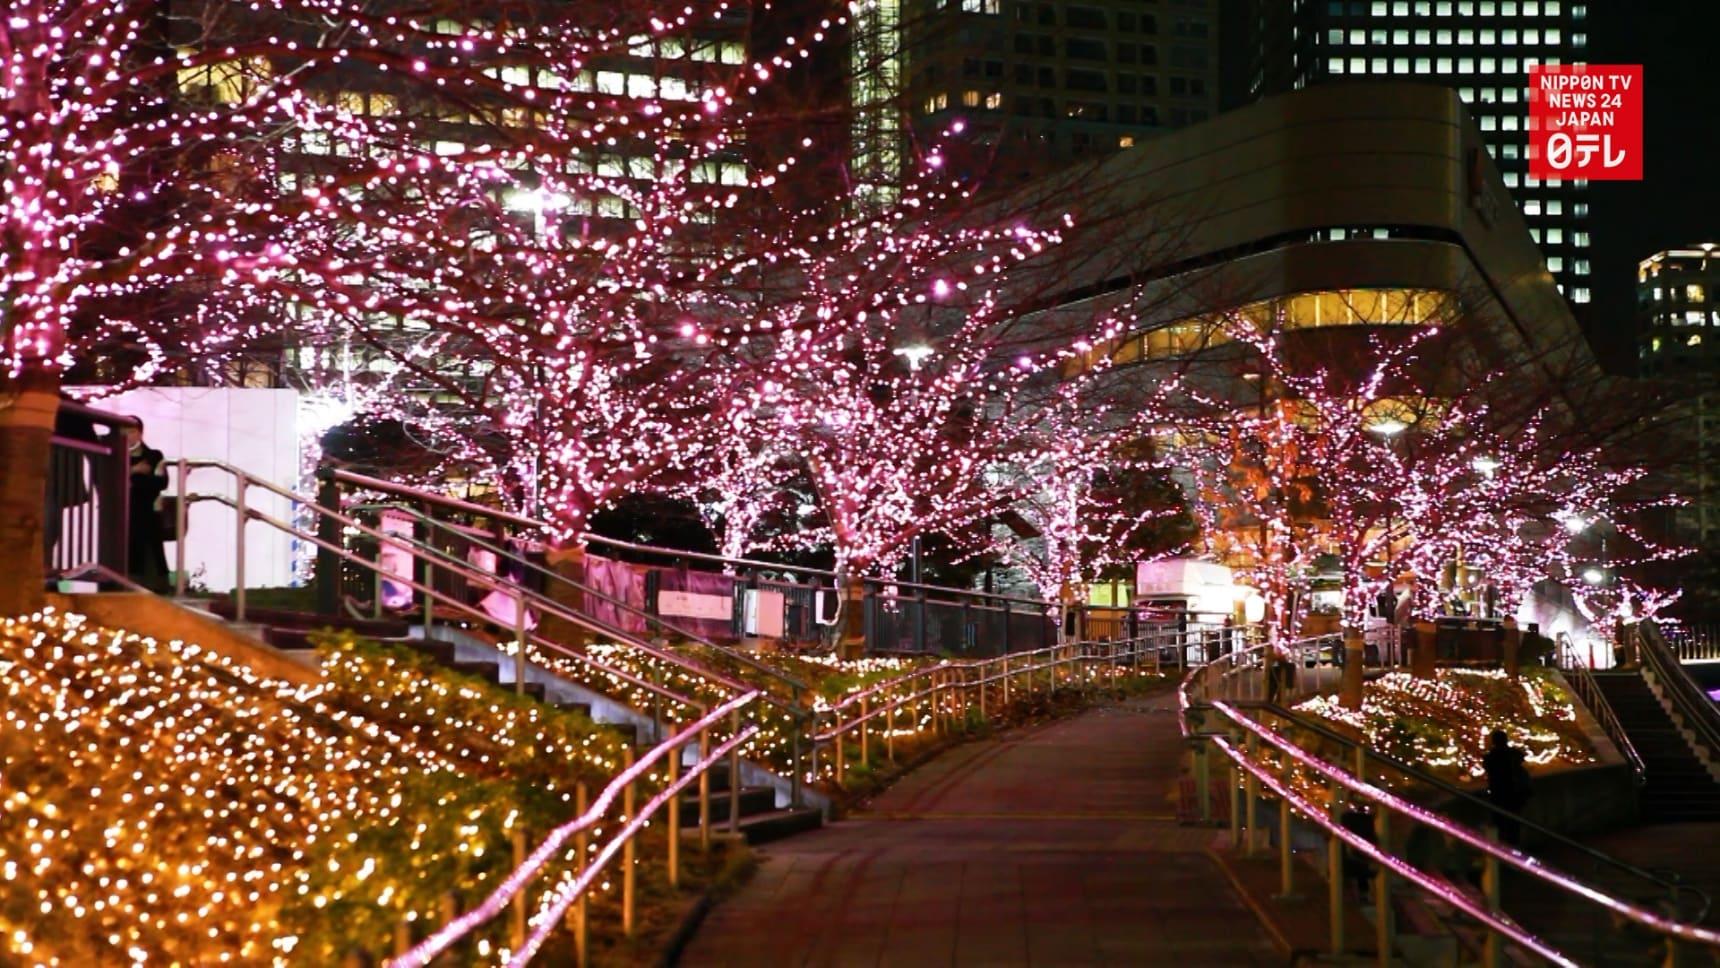 Waste Oil Helps Illuminate Tokyo in Winter